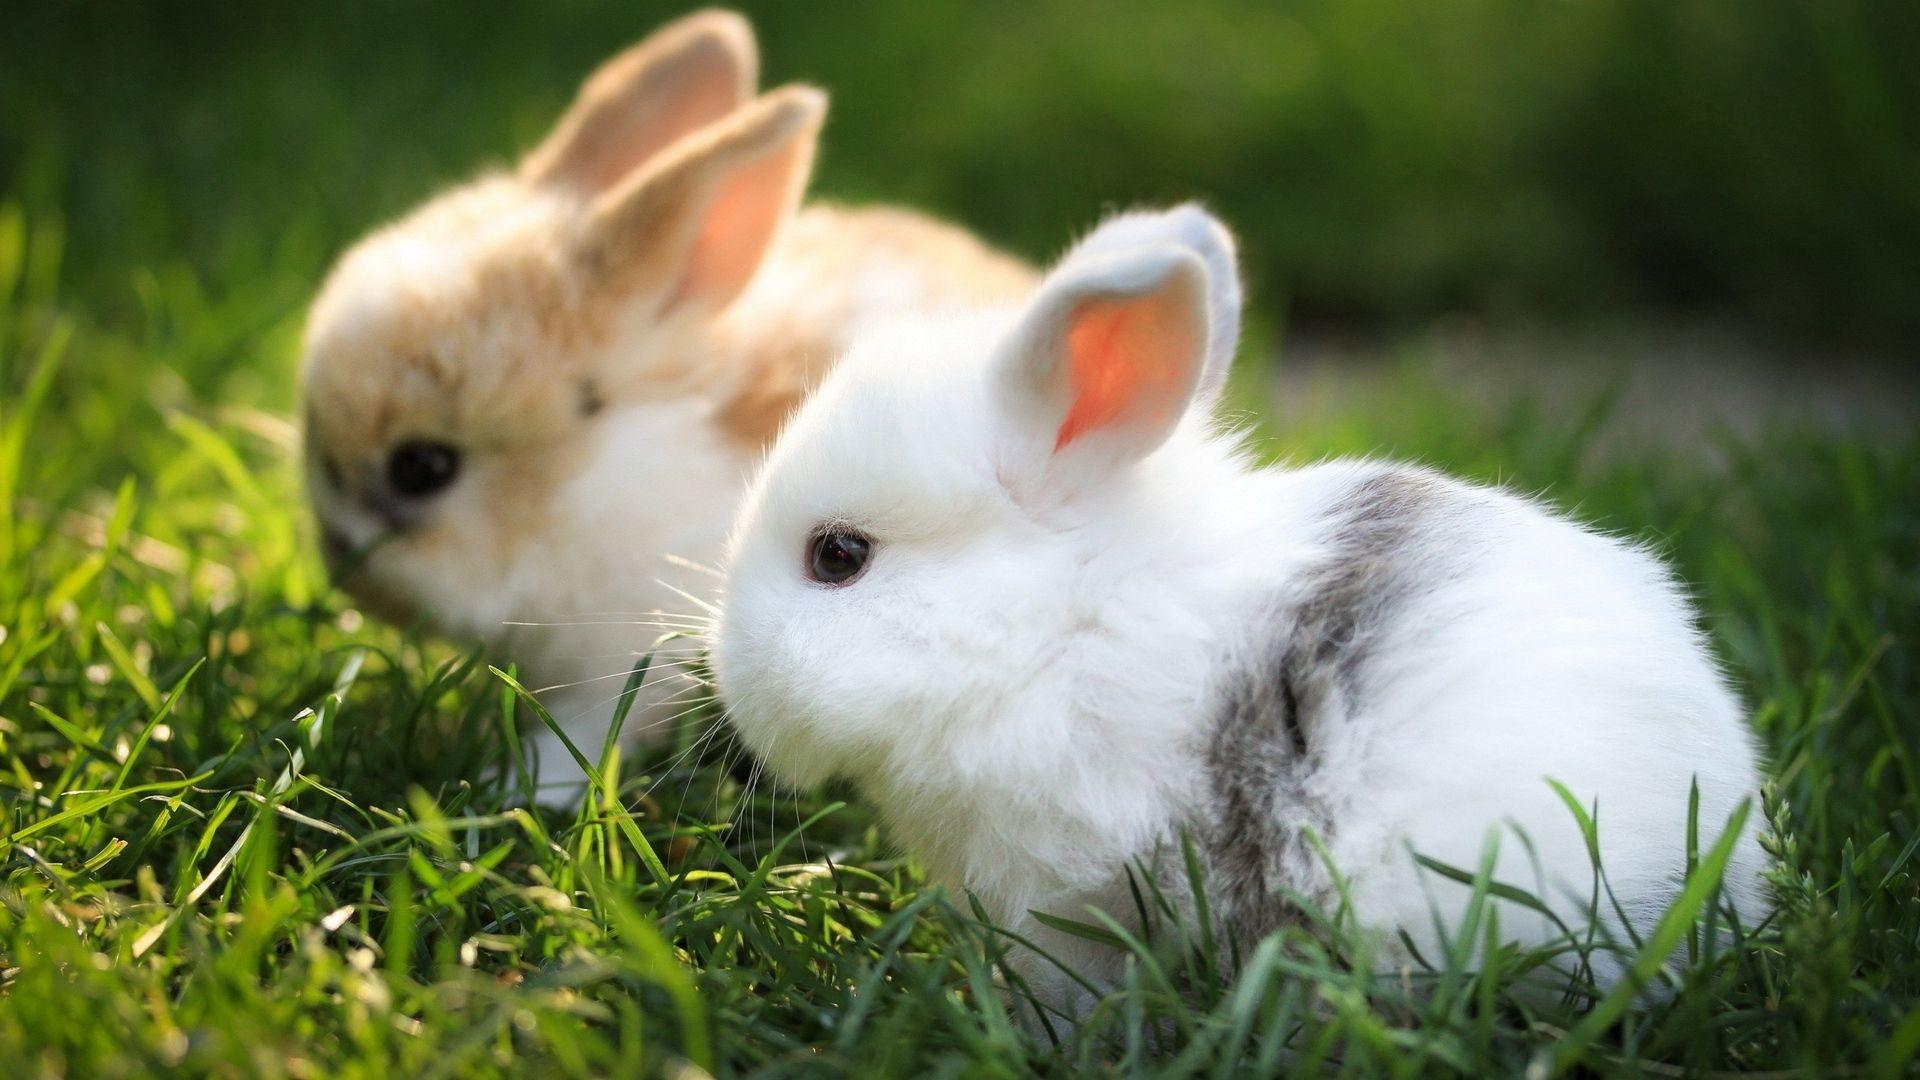 Bunny Background Wallpaper HD